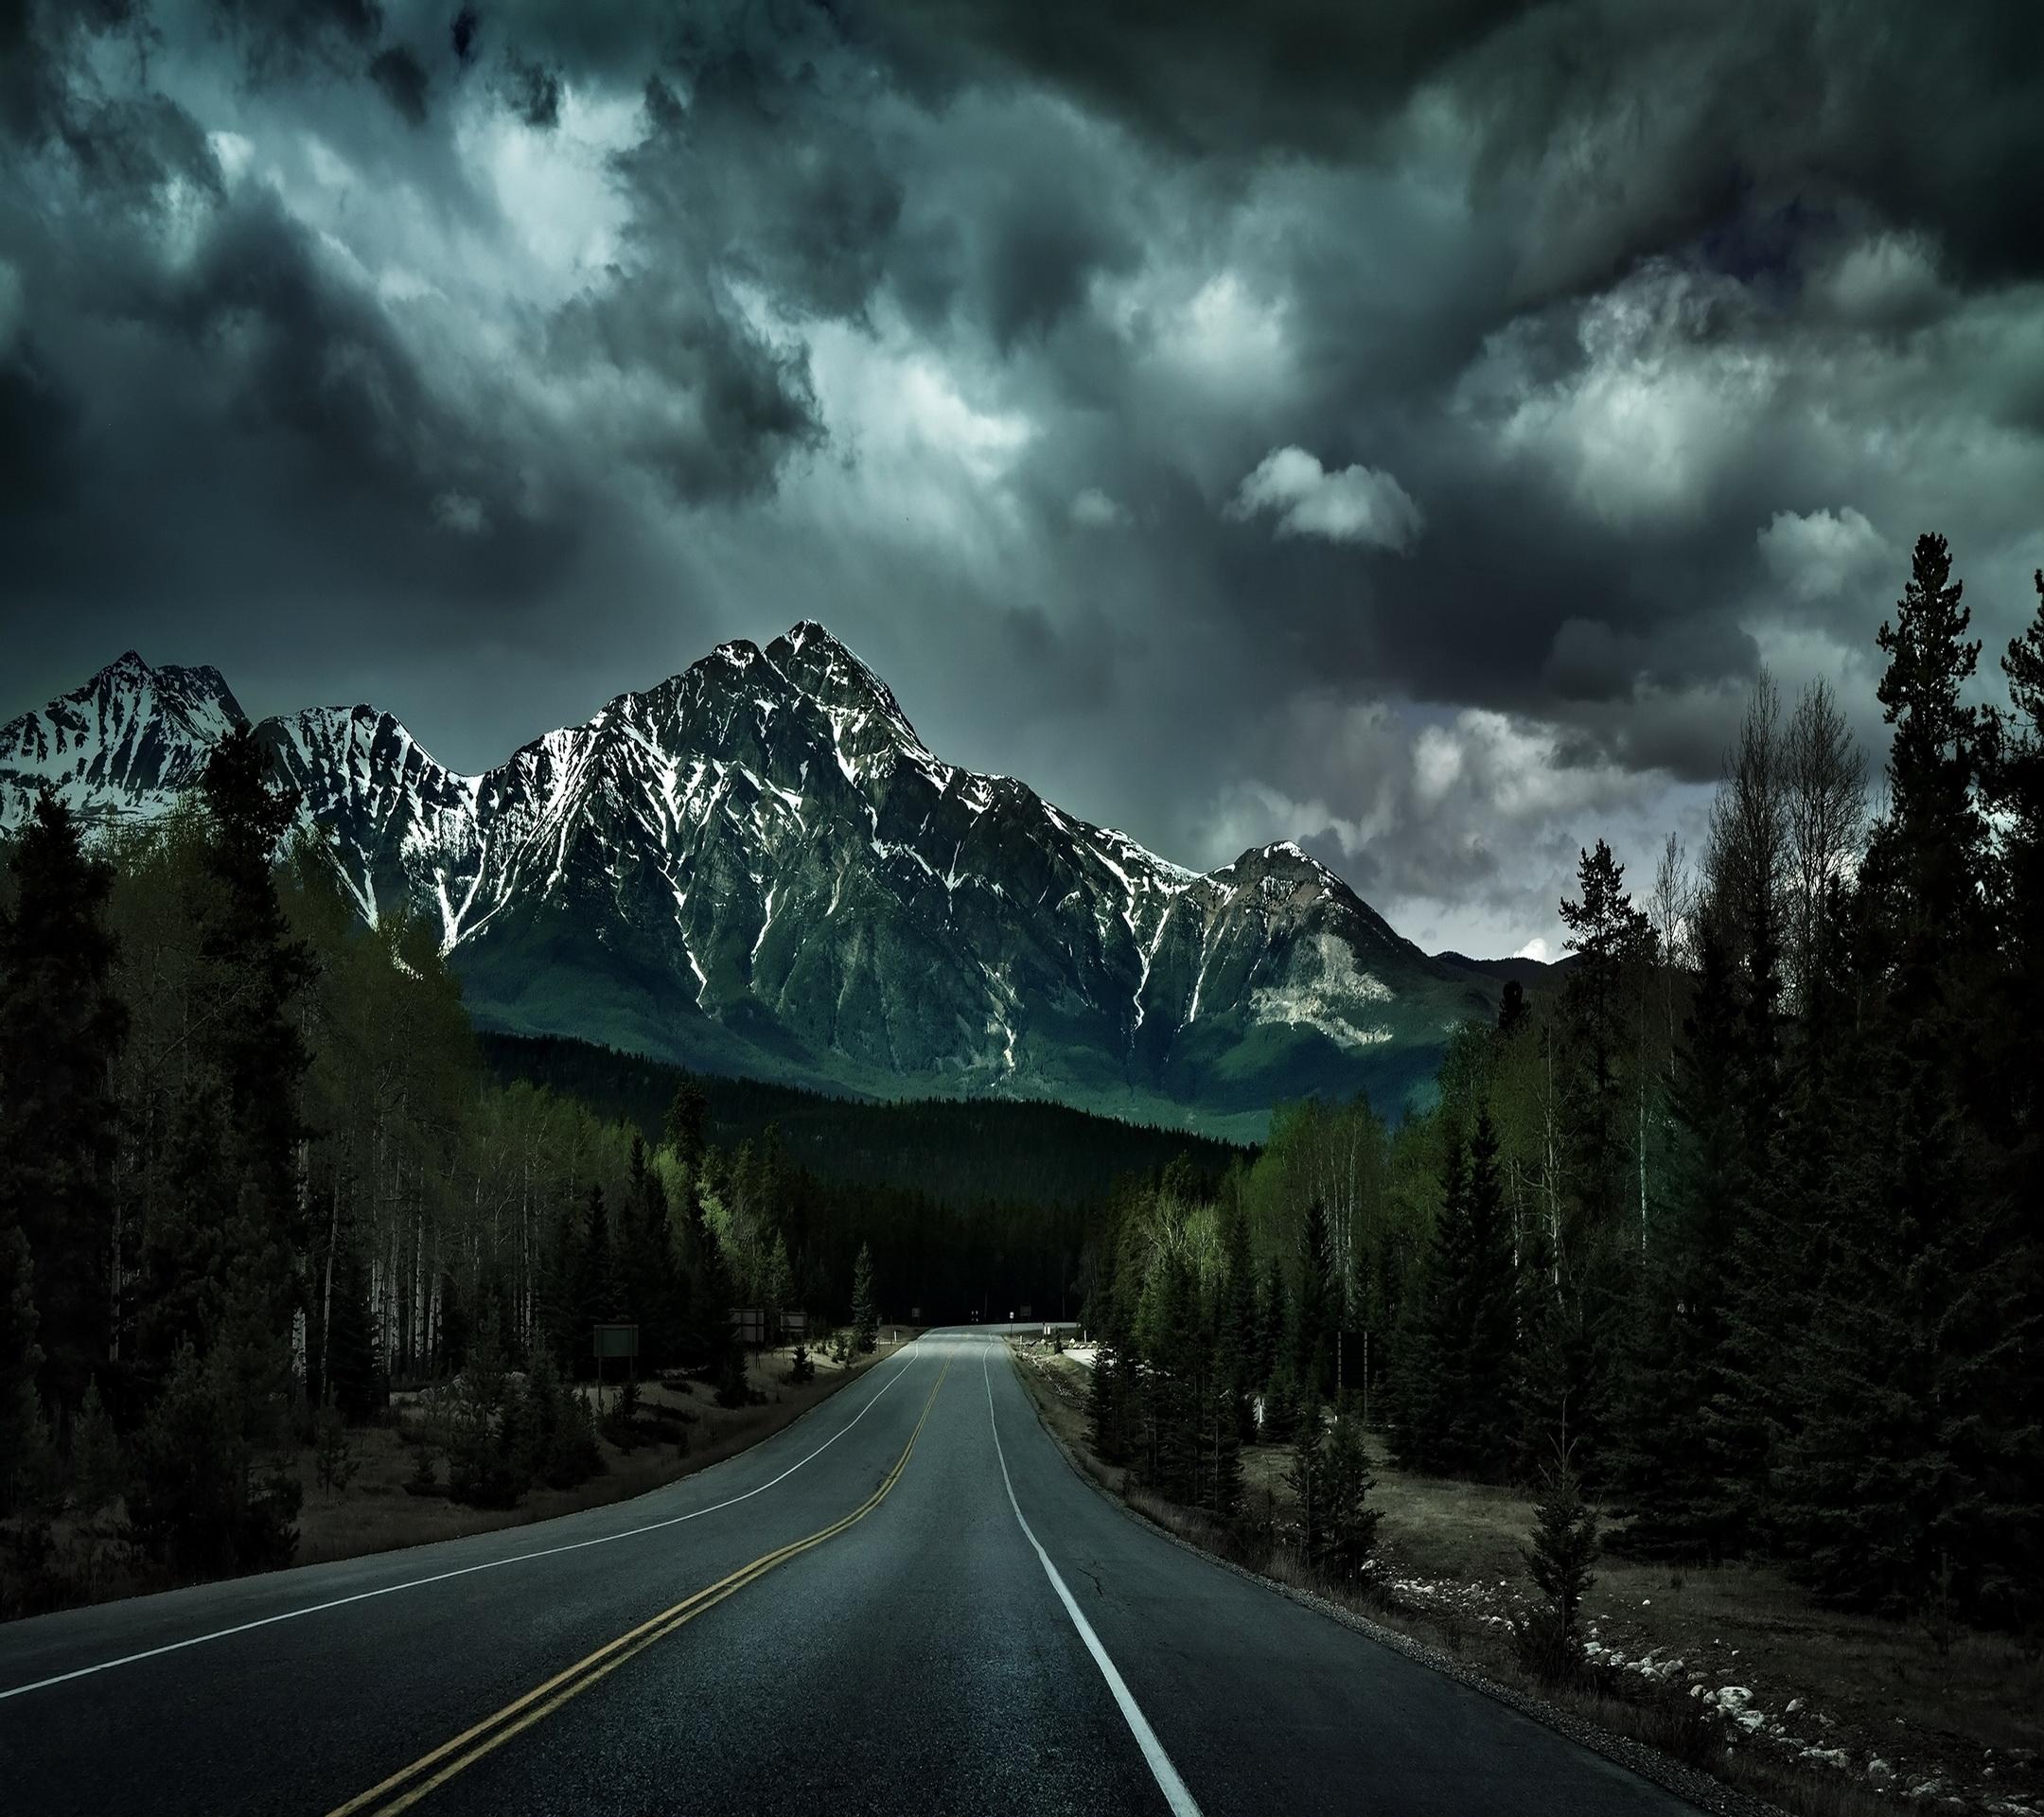 Amazing Wallpaper Mountain Polygon - RoadMountain  Image_416452.jpg